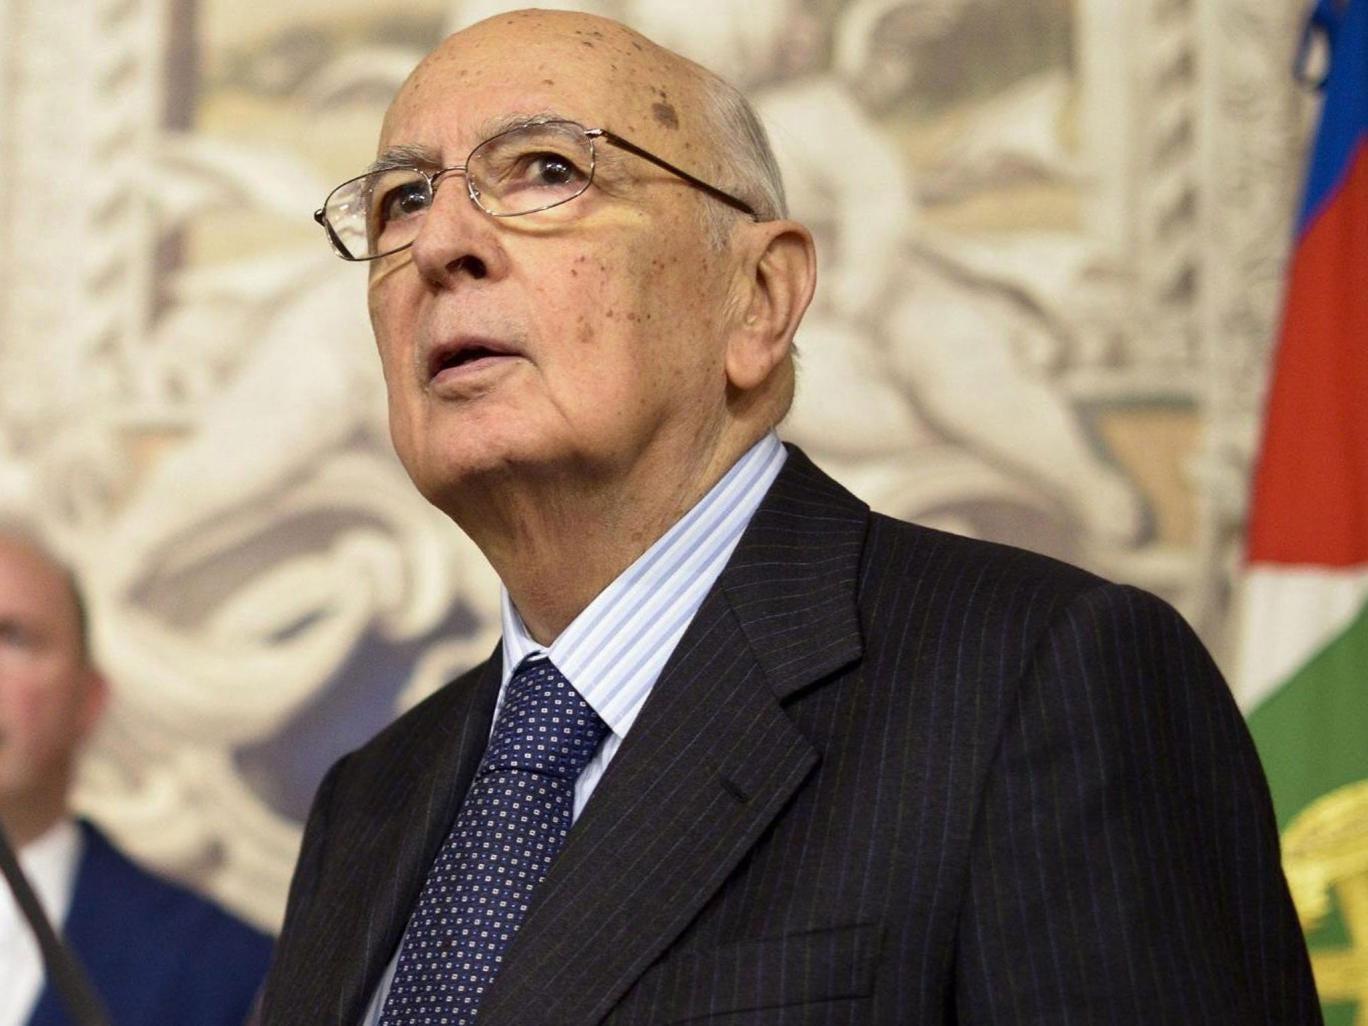 Giorgio Napolitano was re-elected as Italy's President